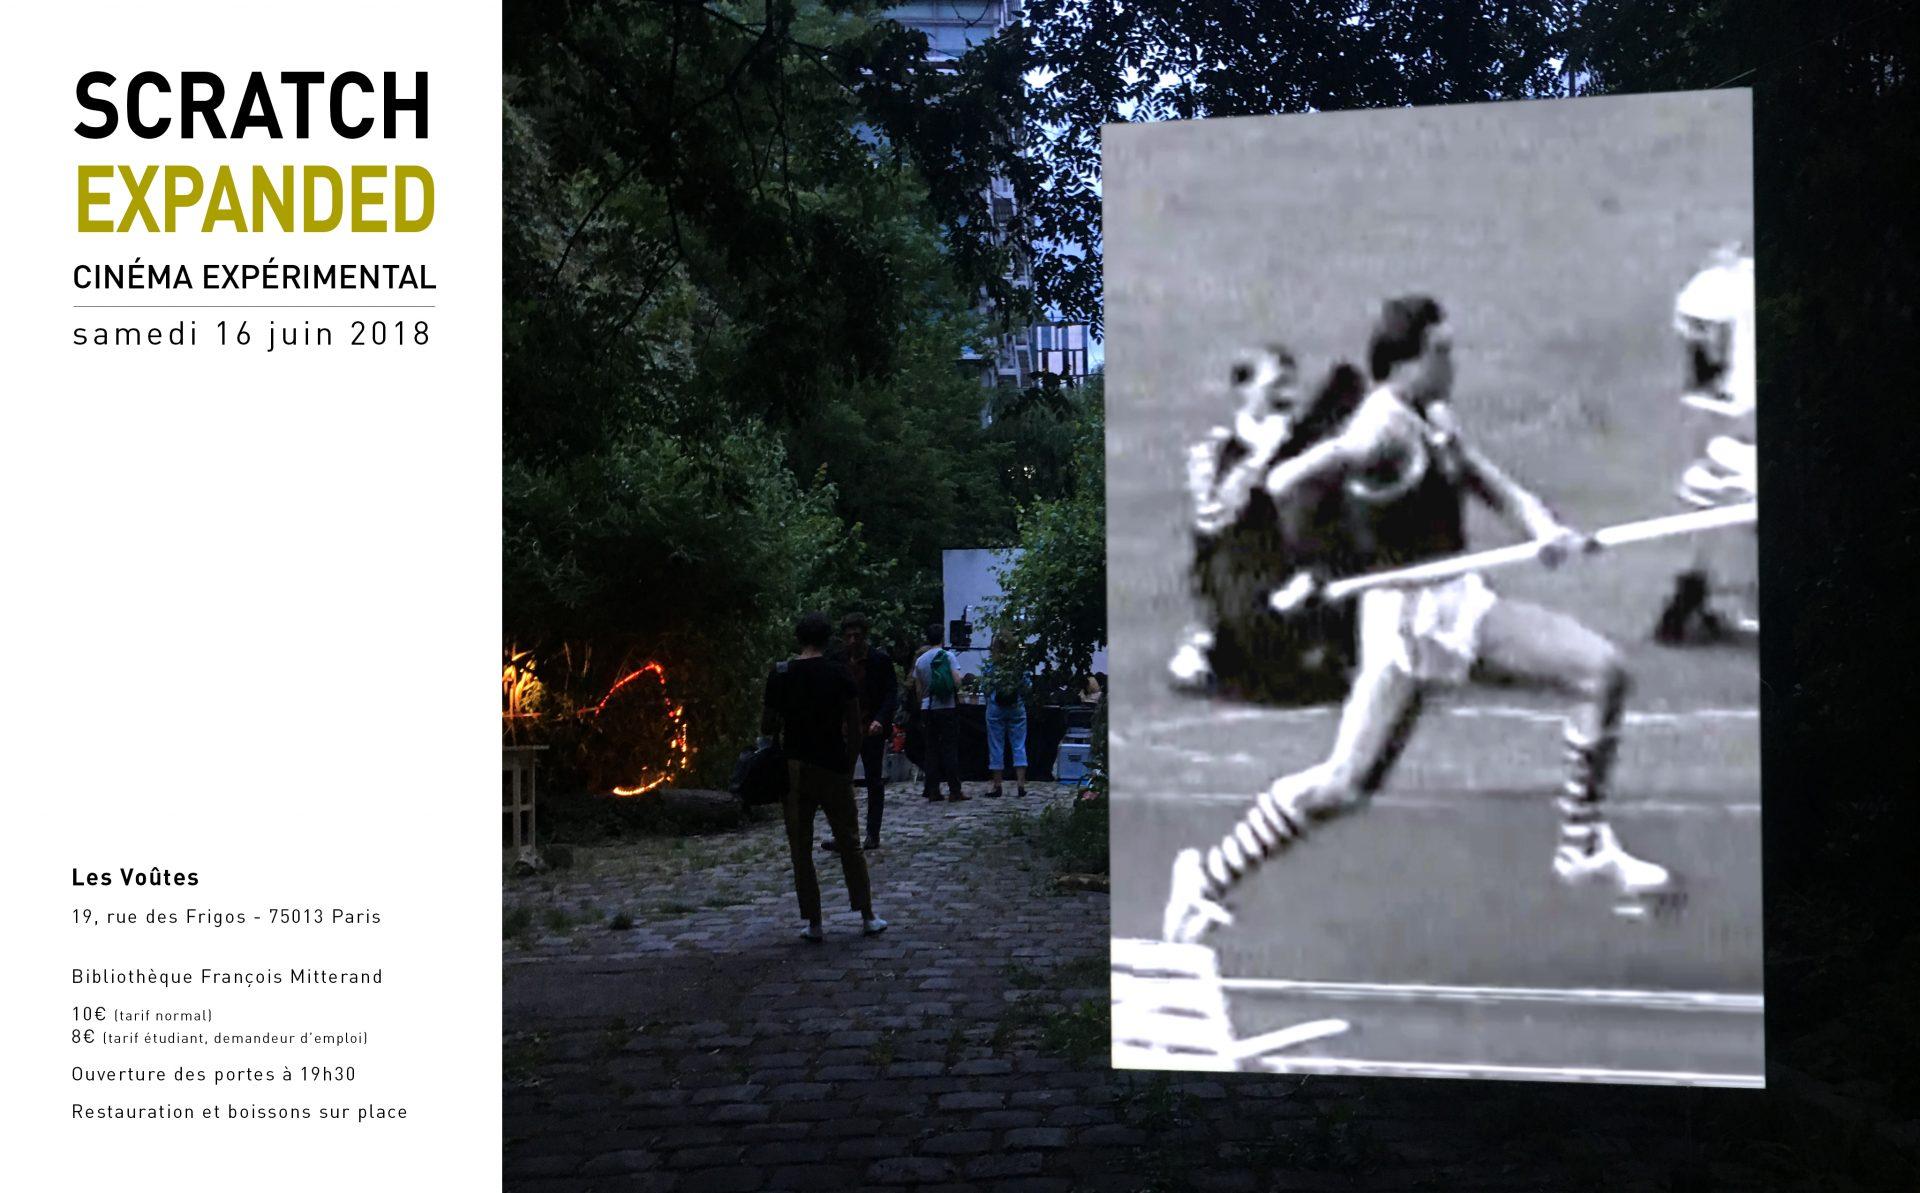 karen-luong-bubka-installation-scratch-expanded-light-cone-voutes-frigo-2018-paris